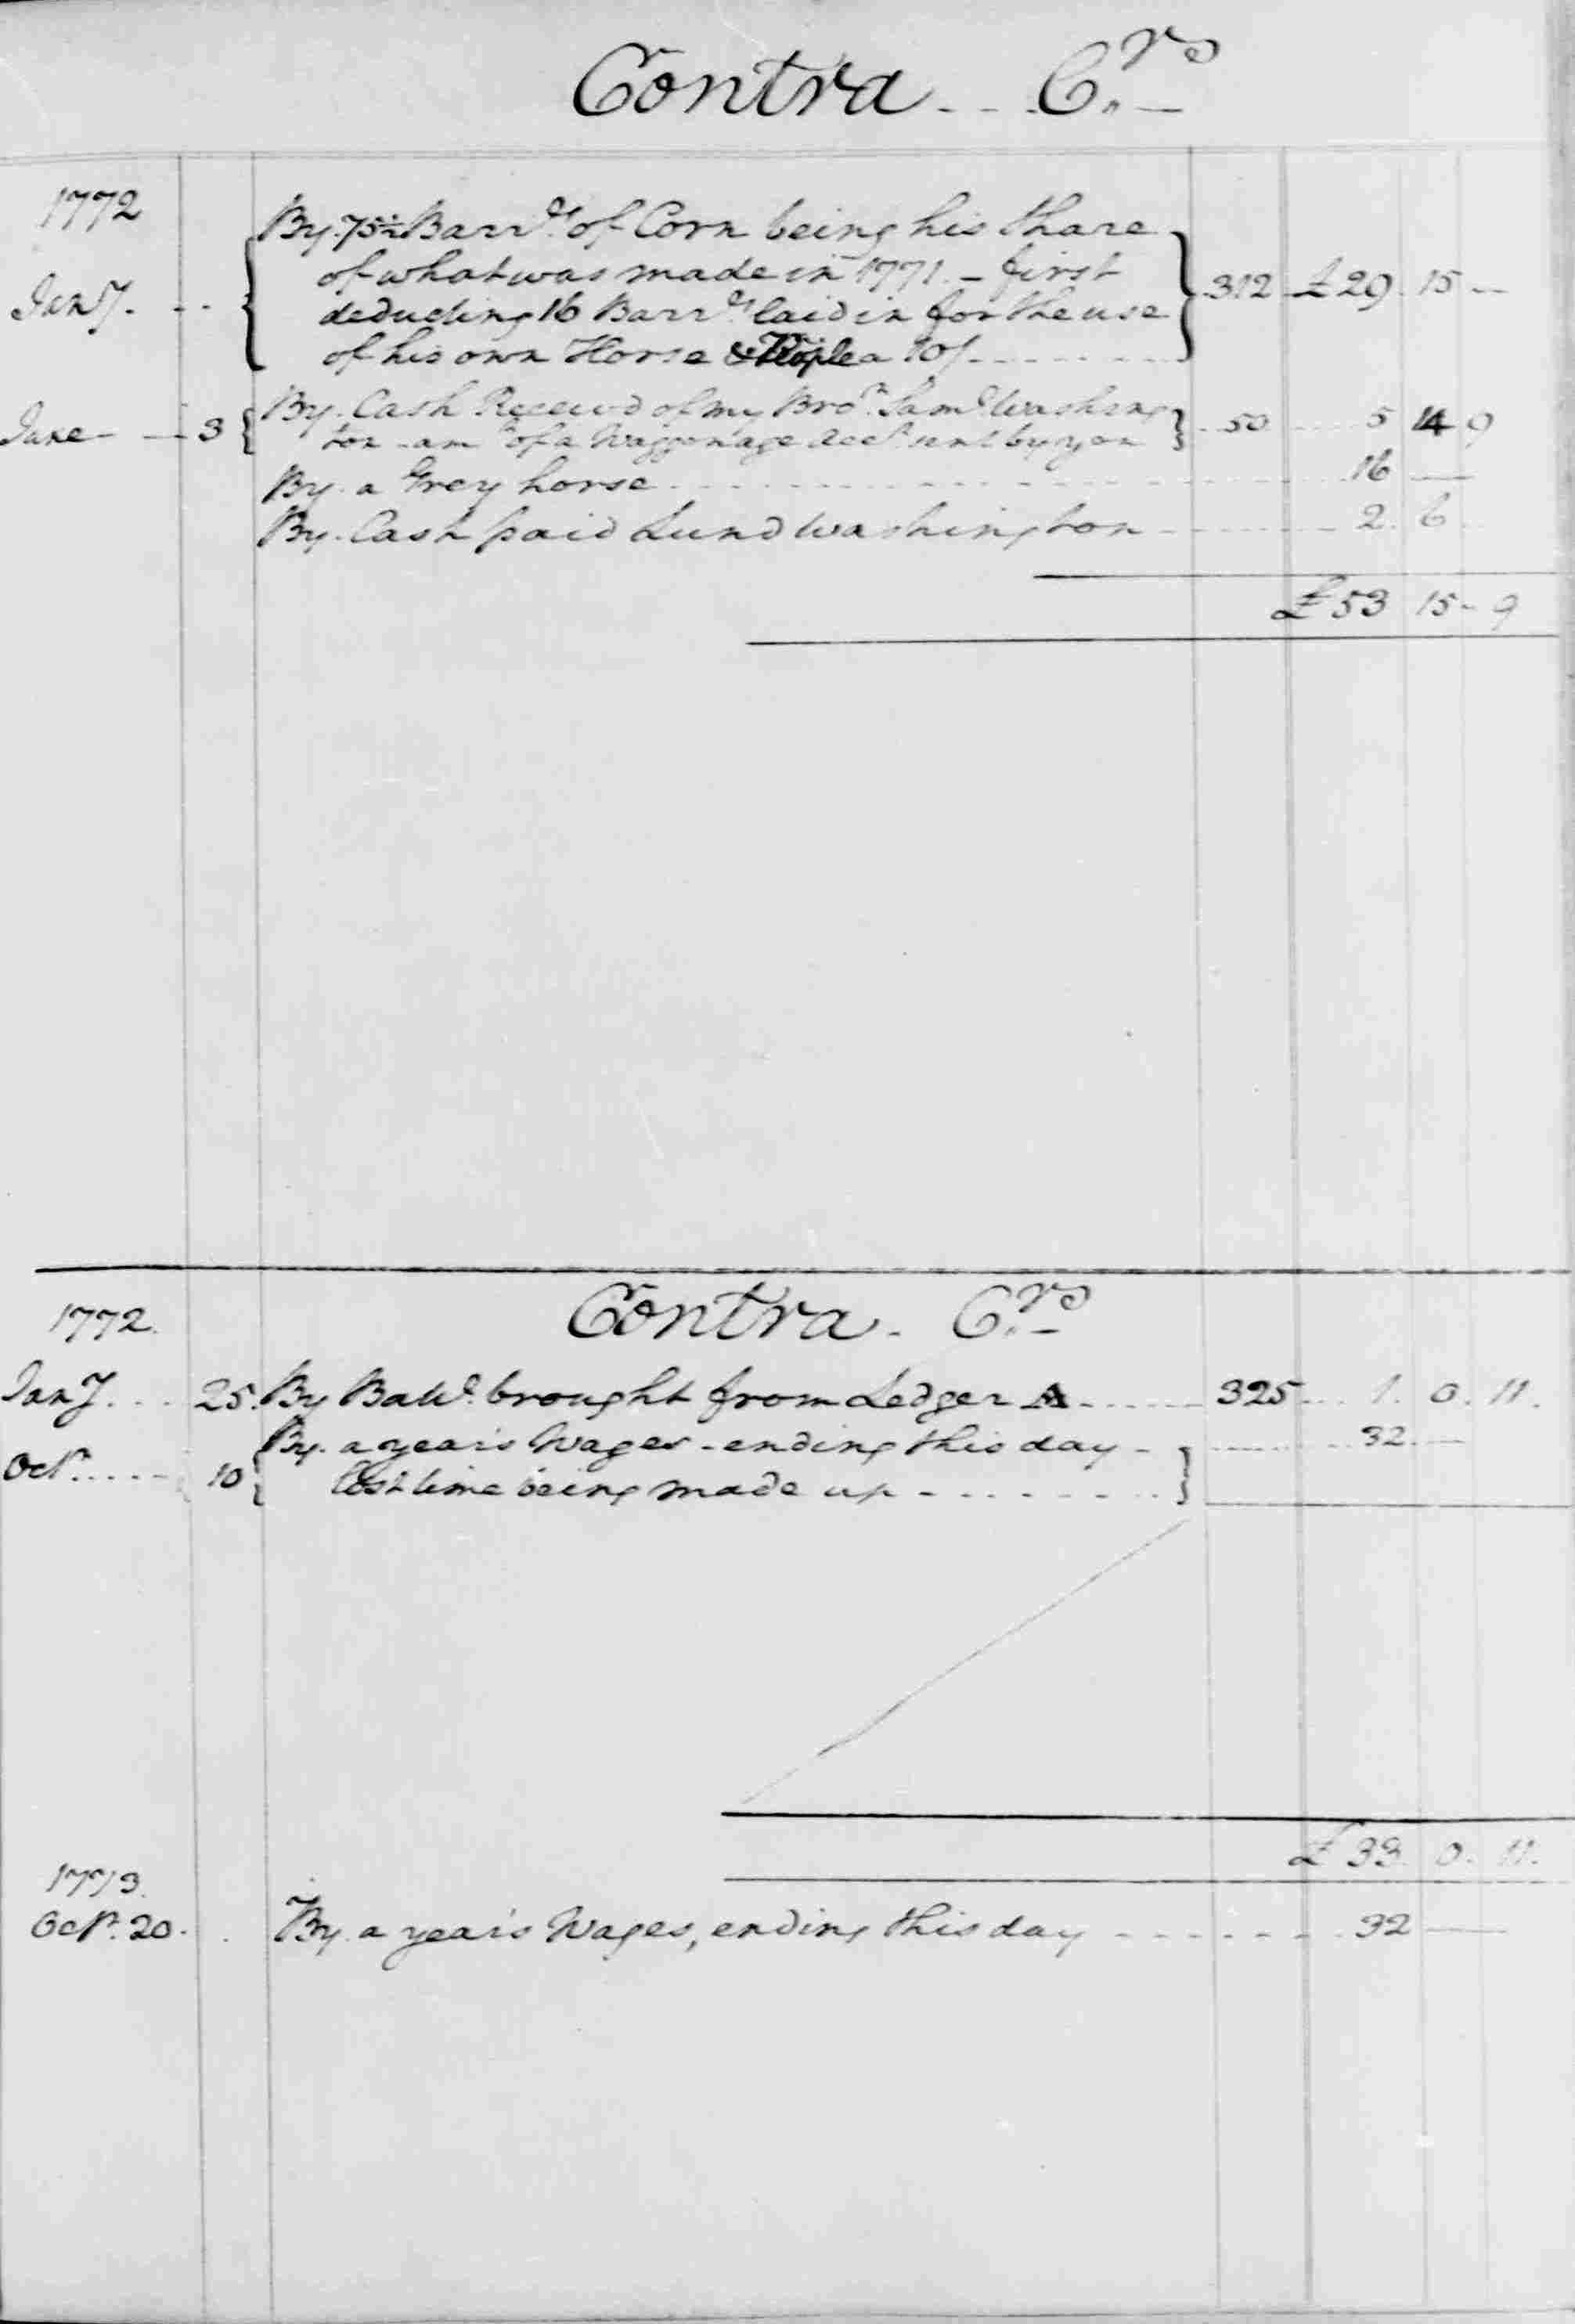 Ledger B, folio 34, right side